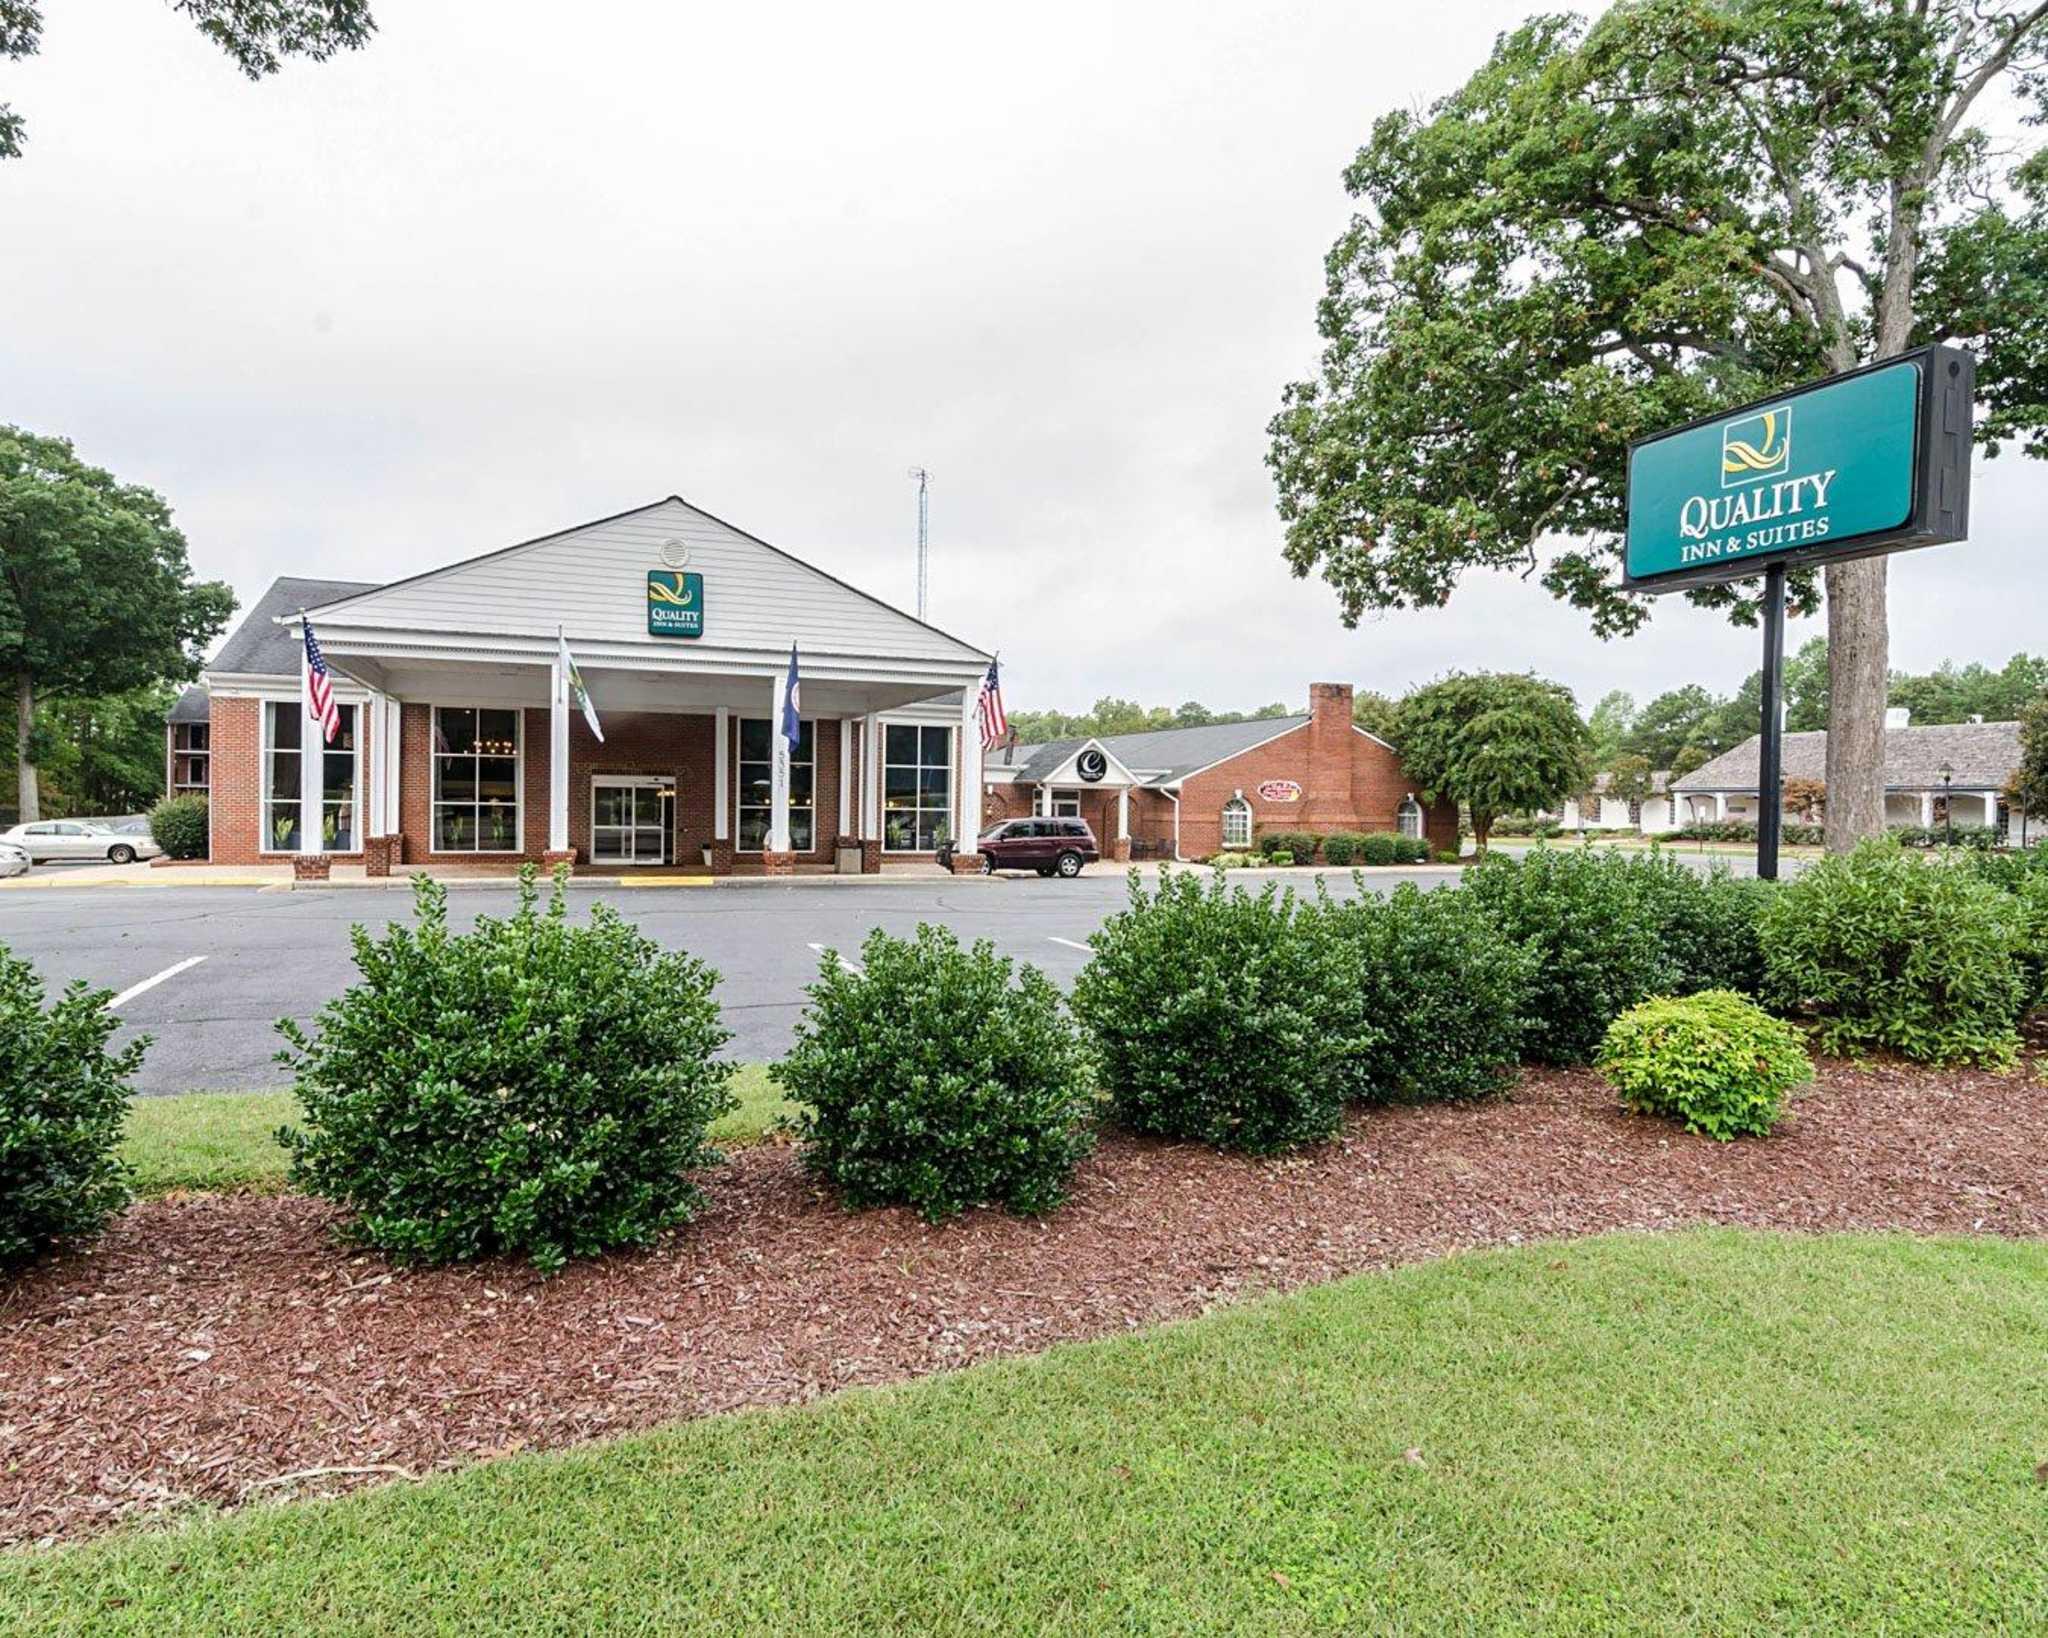 Hotels business in Williamsburg, VA, United States